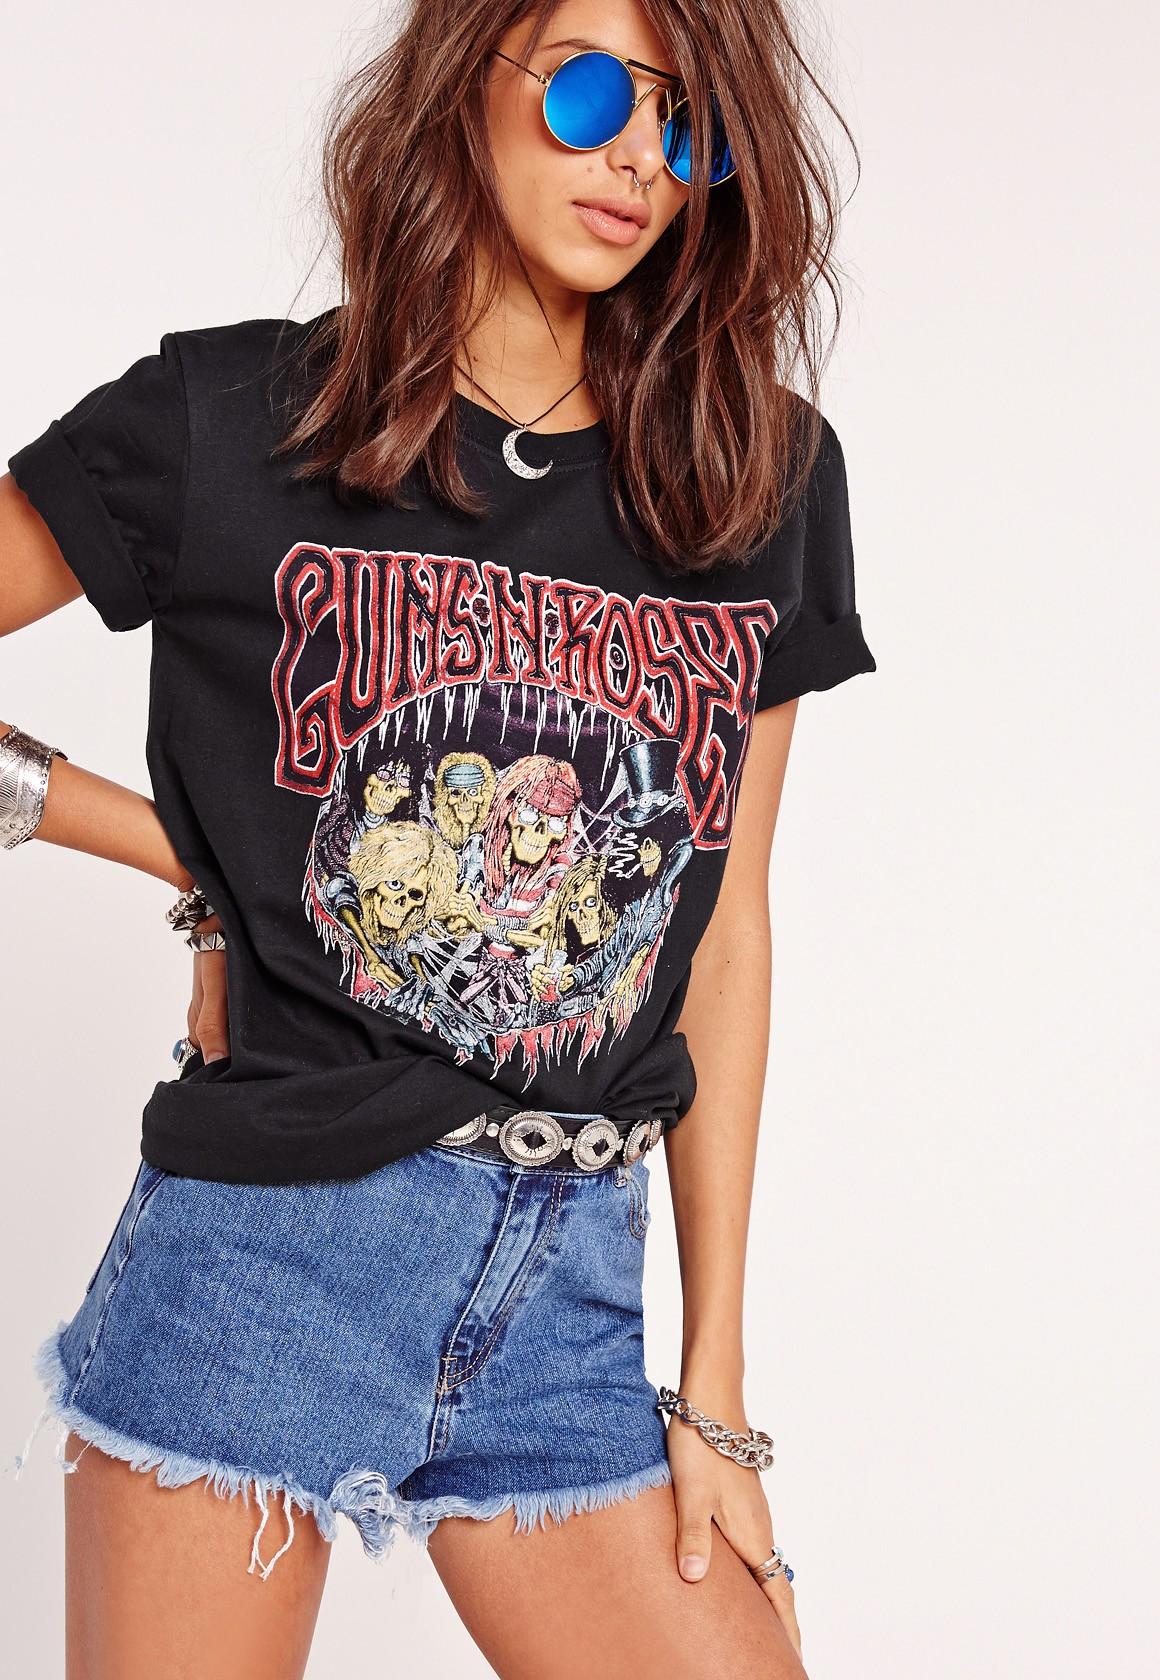 Guns n Roses Missguided.jpg